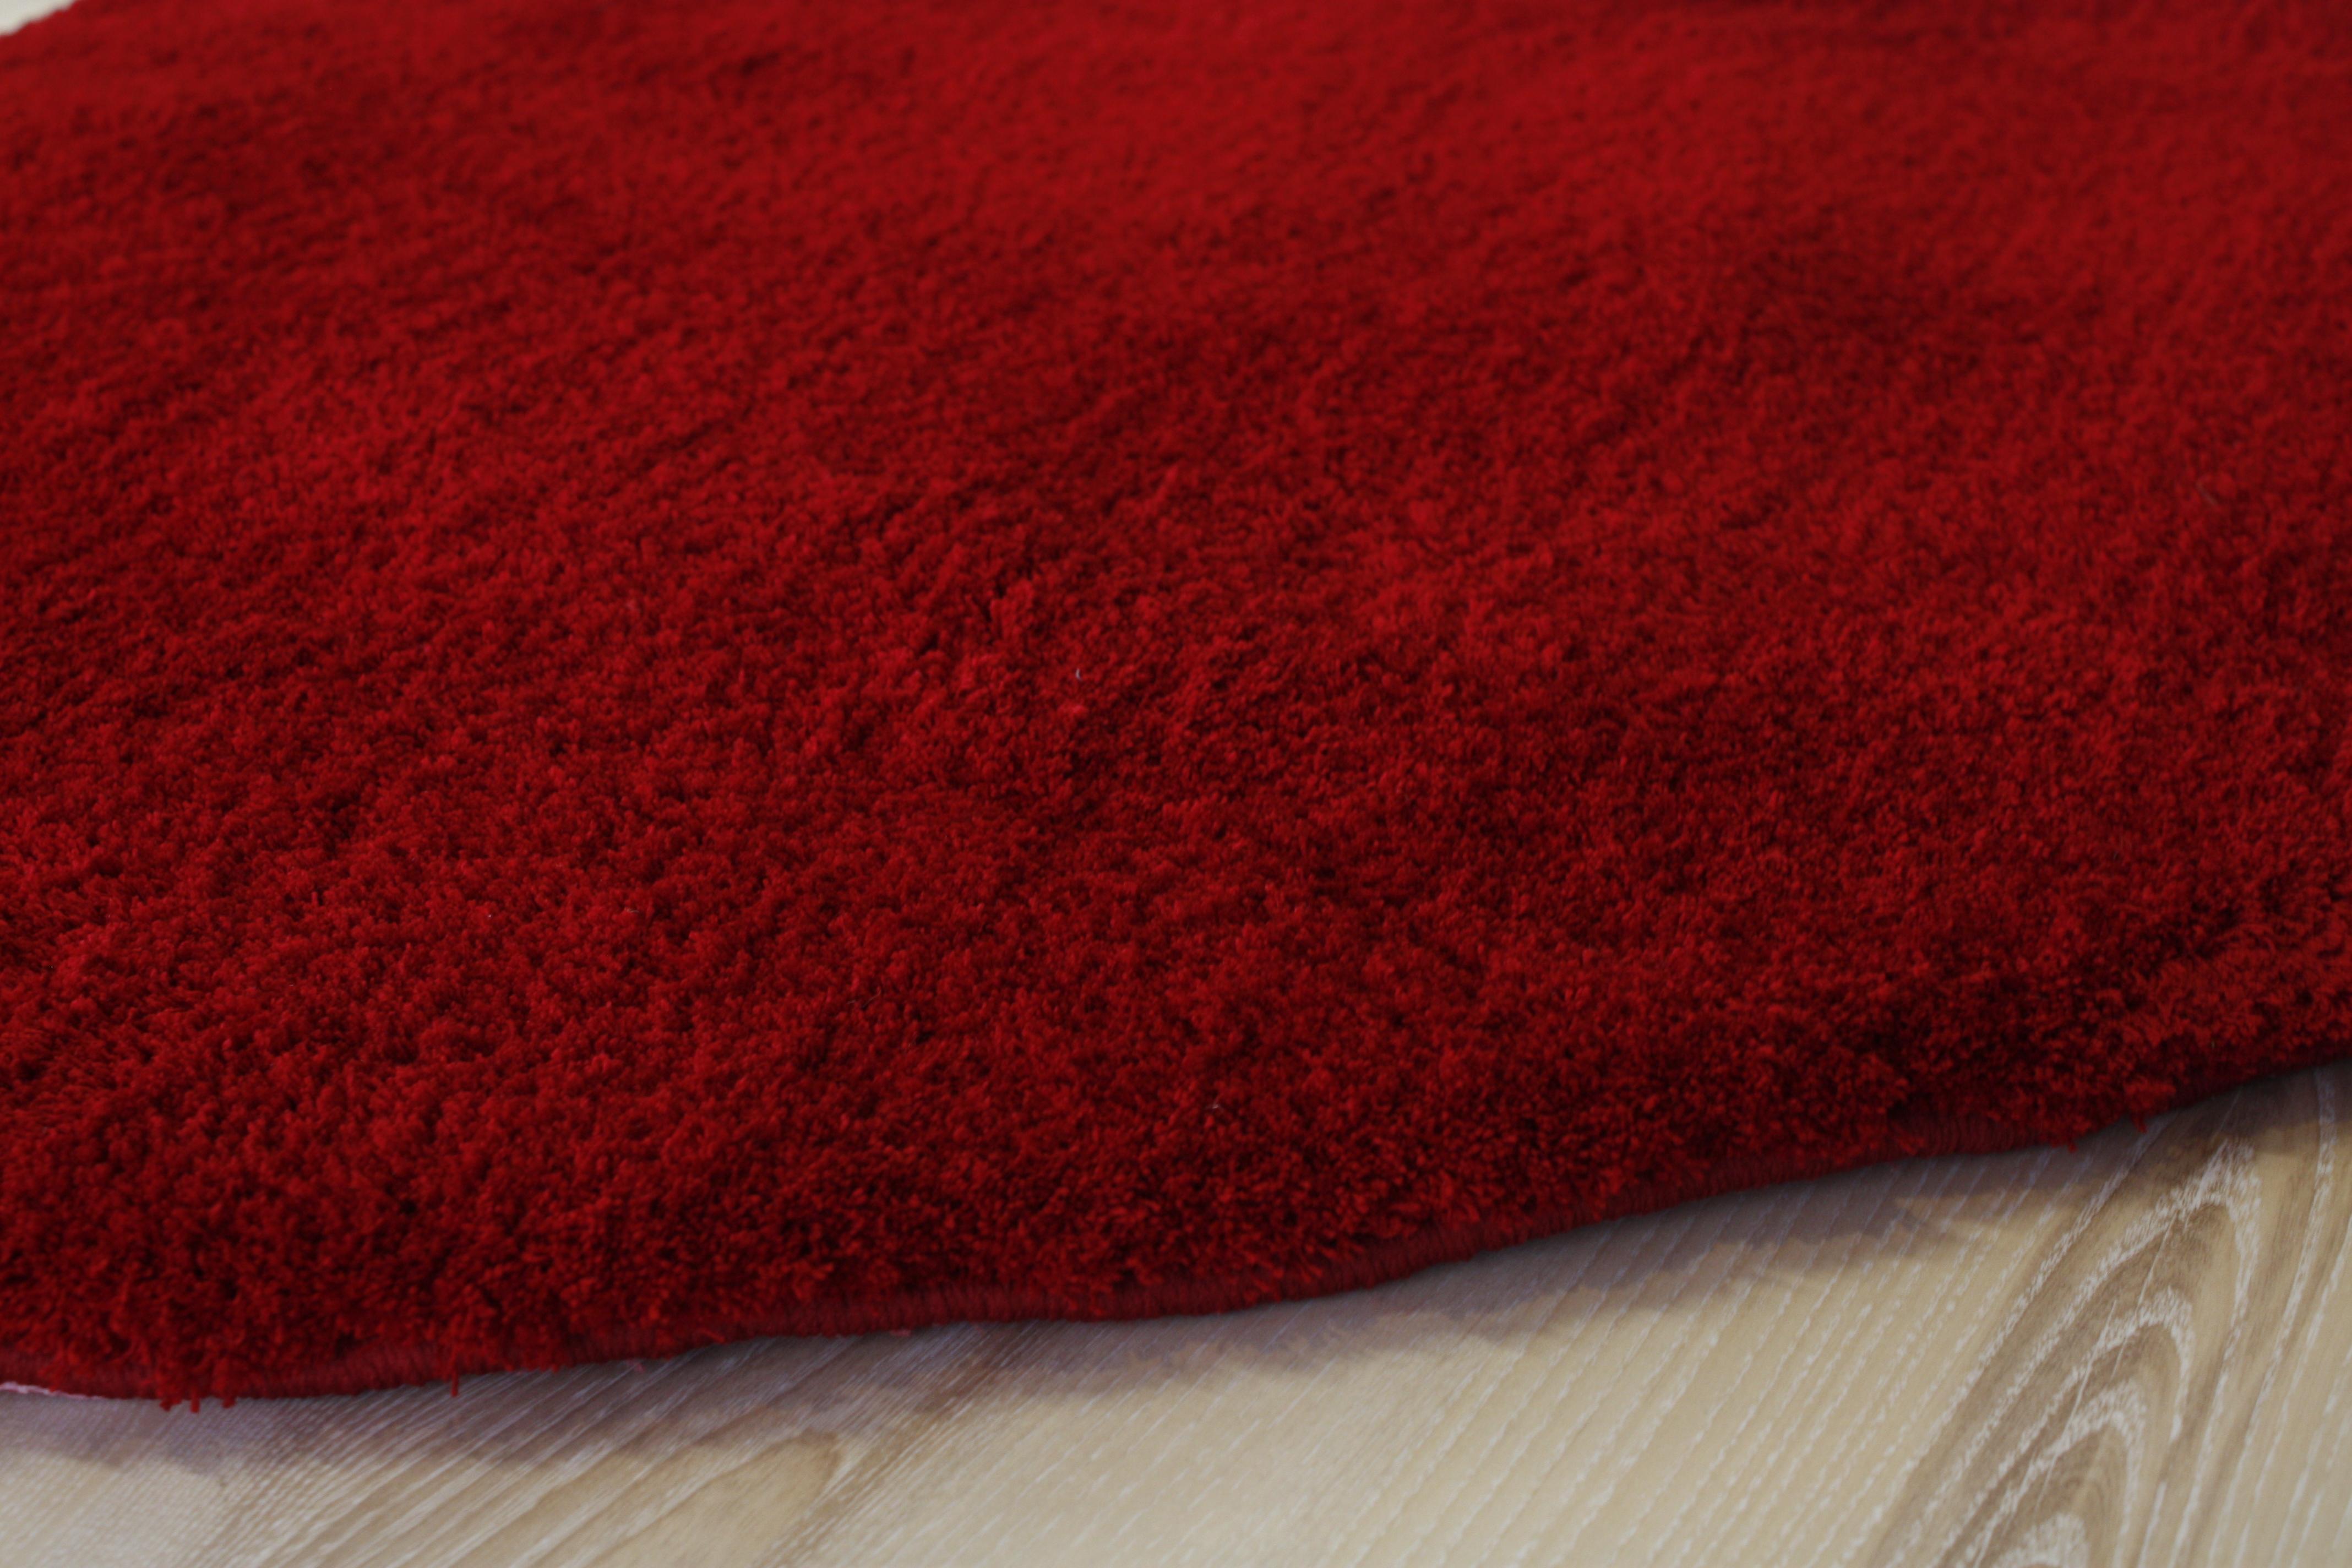 langflor soft shaggy herz teppich 100x100 cm rot ebay. Black Bedroom Furniture Sets. Home Design Ideas